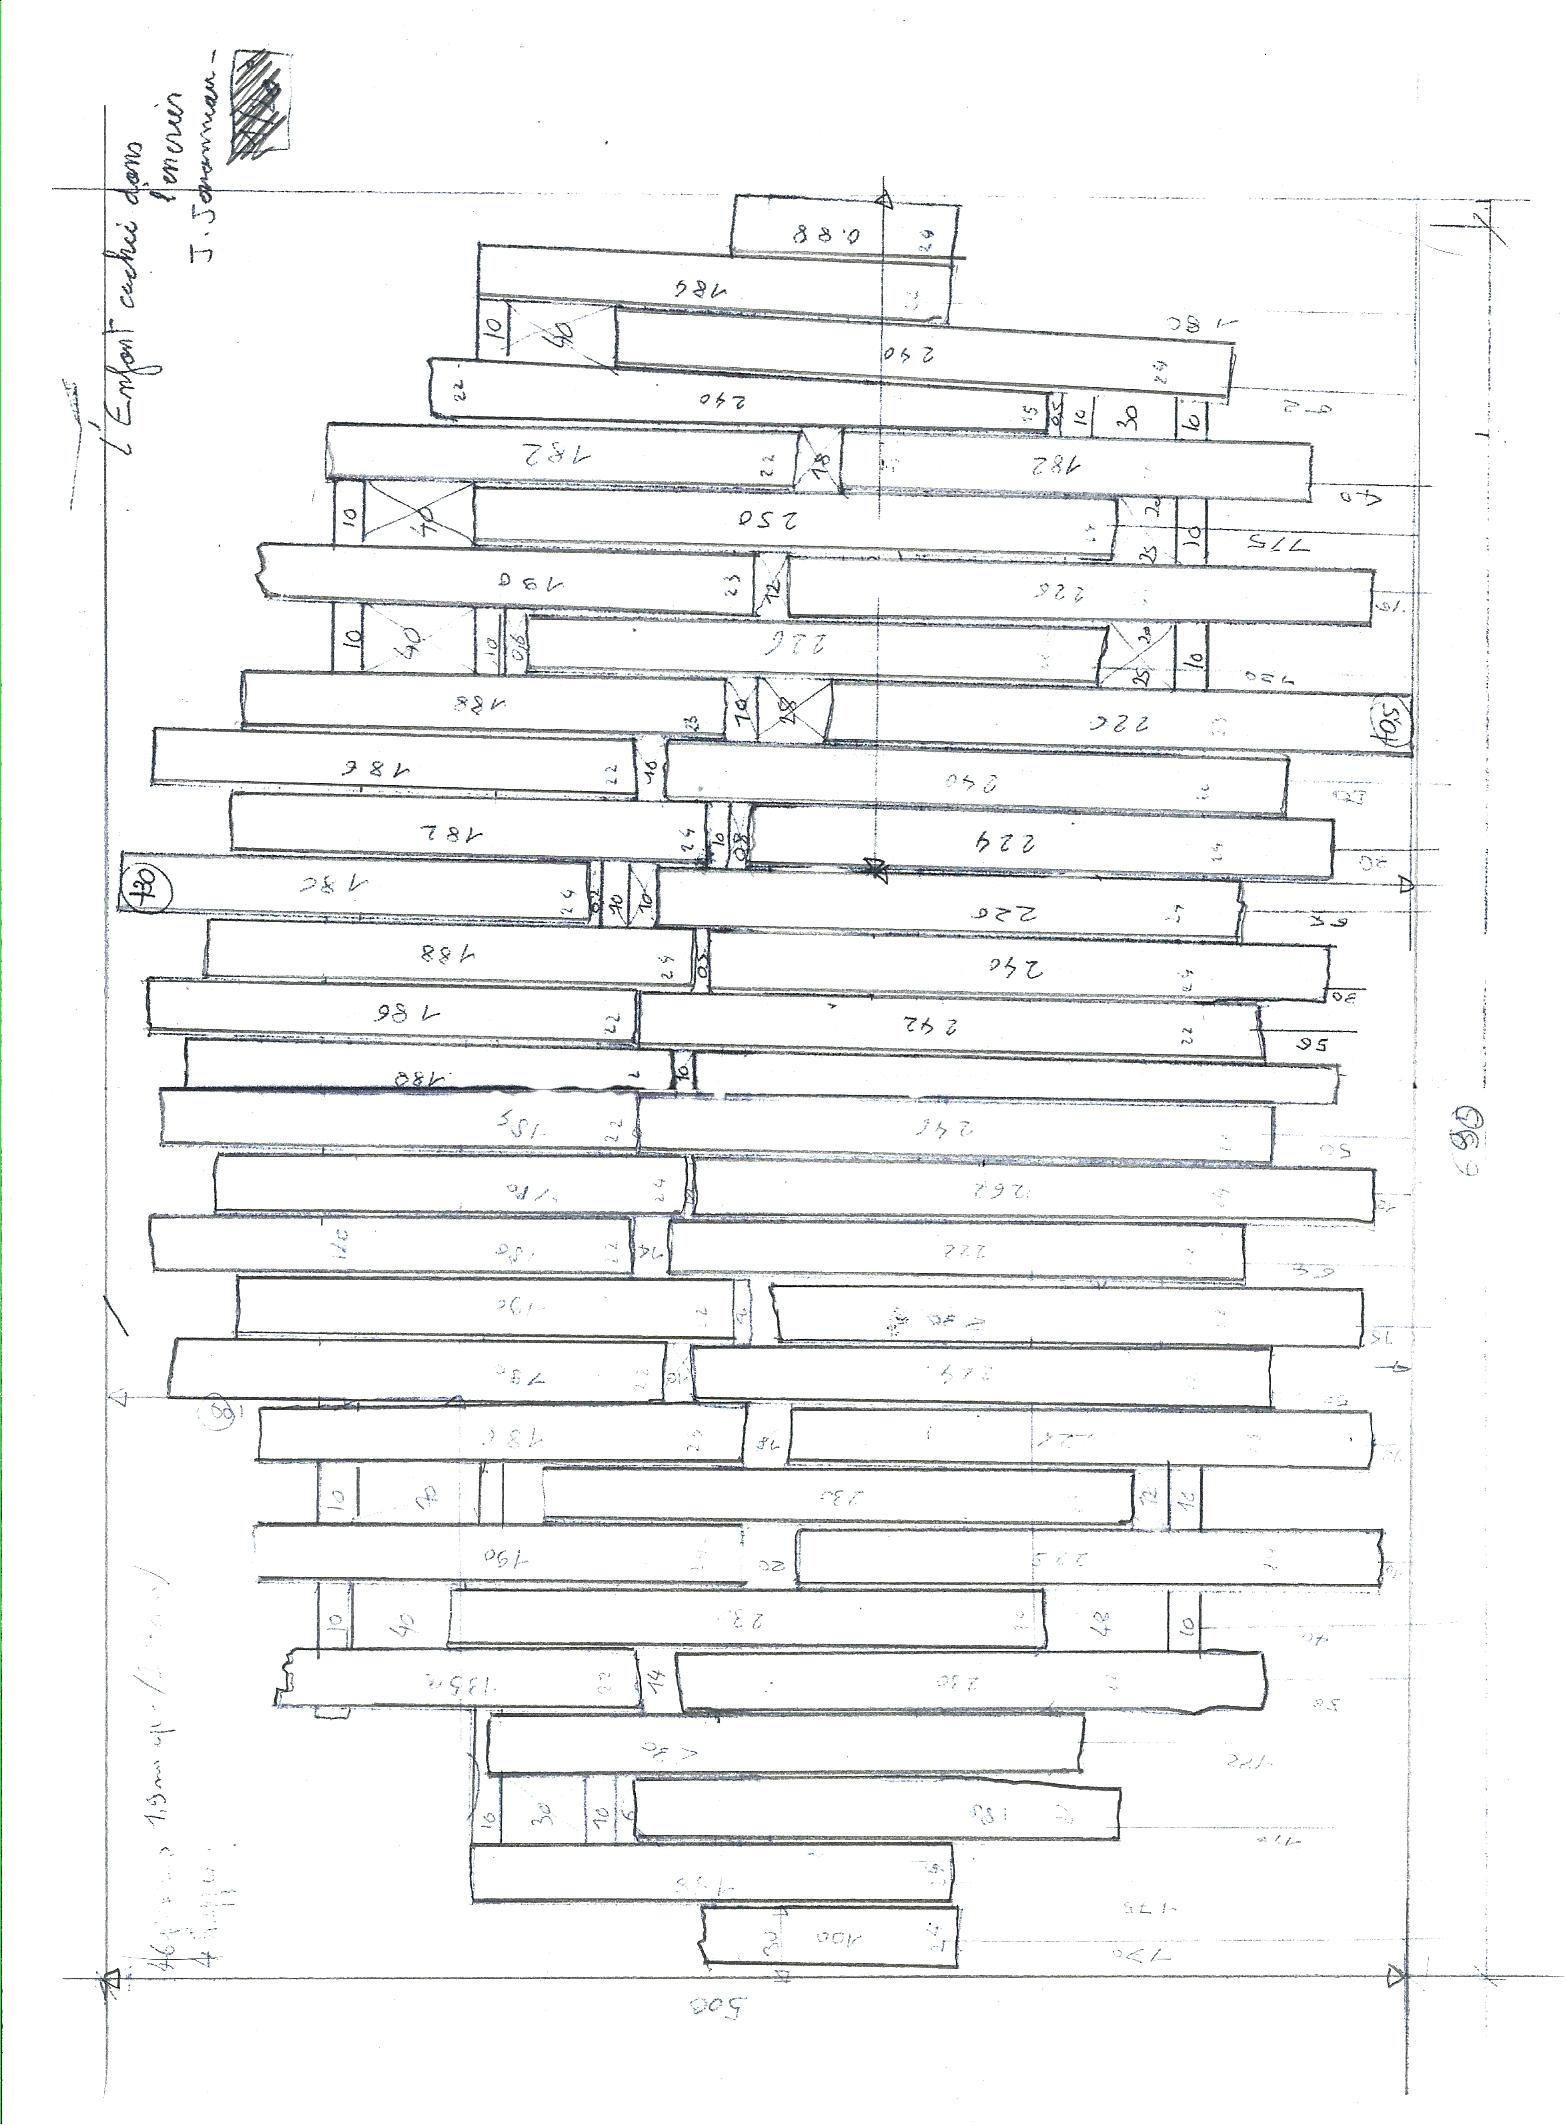 plan_plancher_A4_retracé